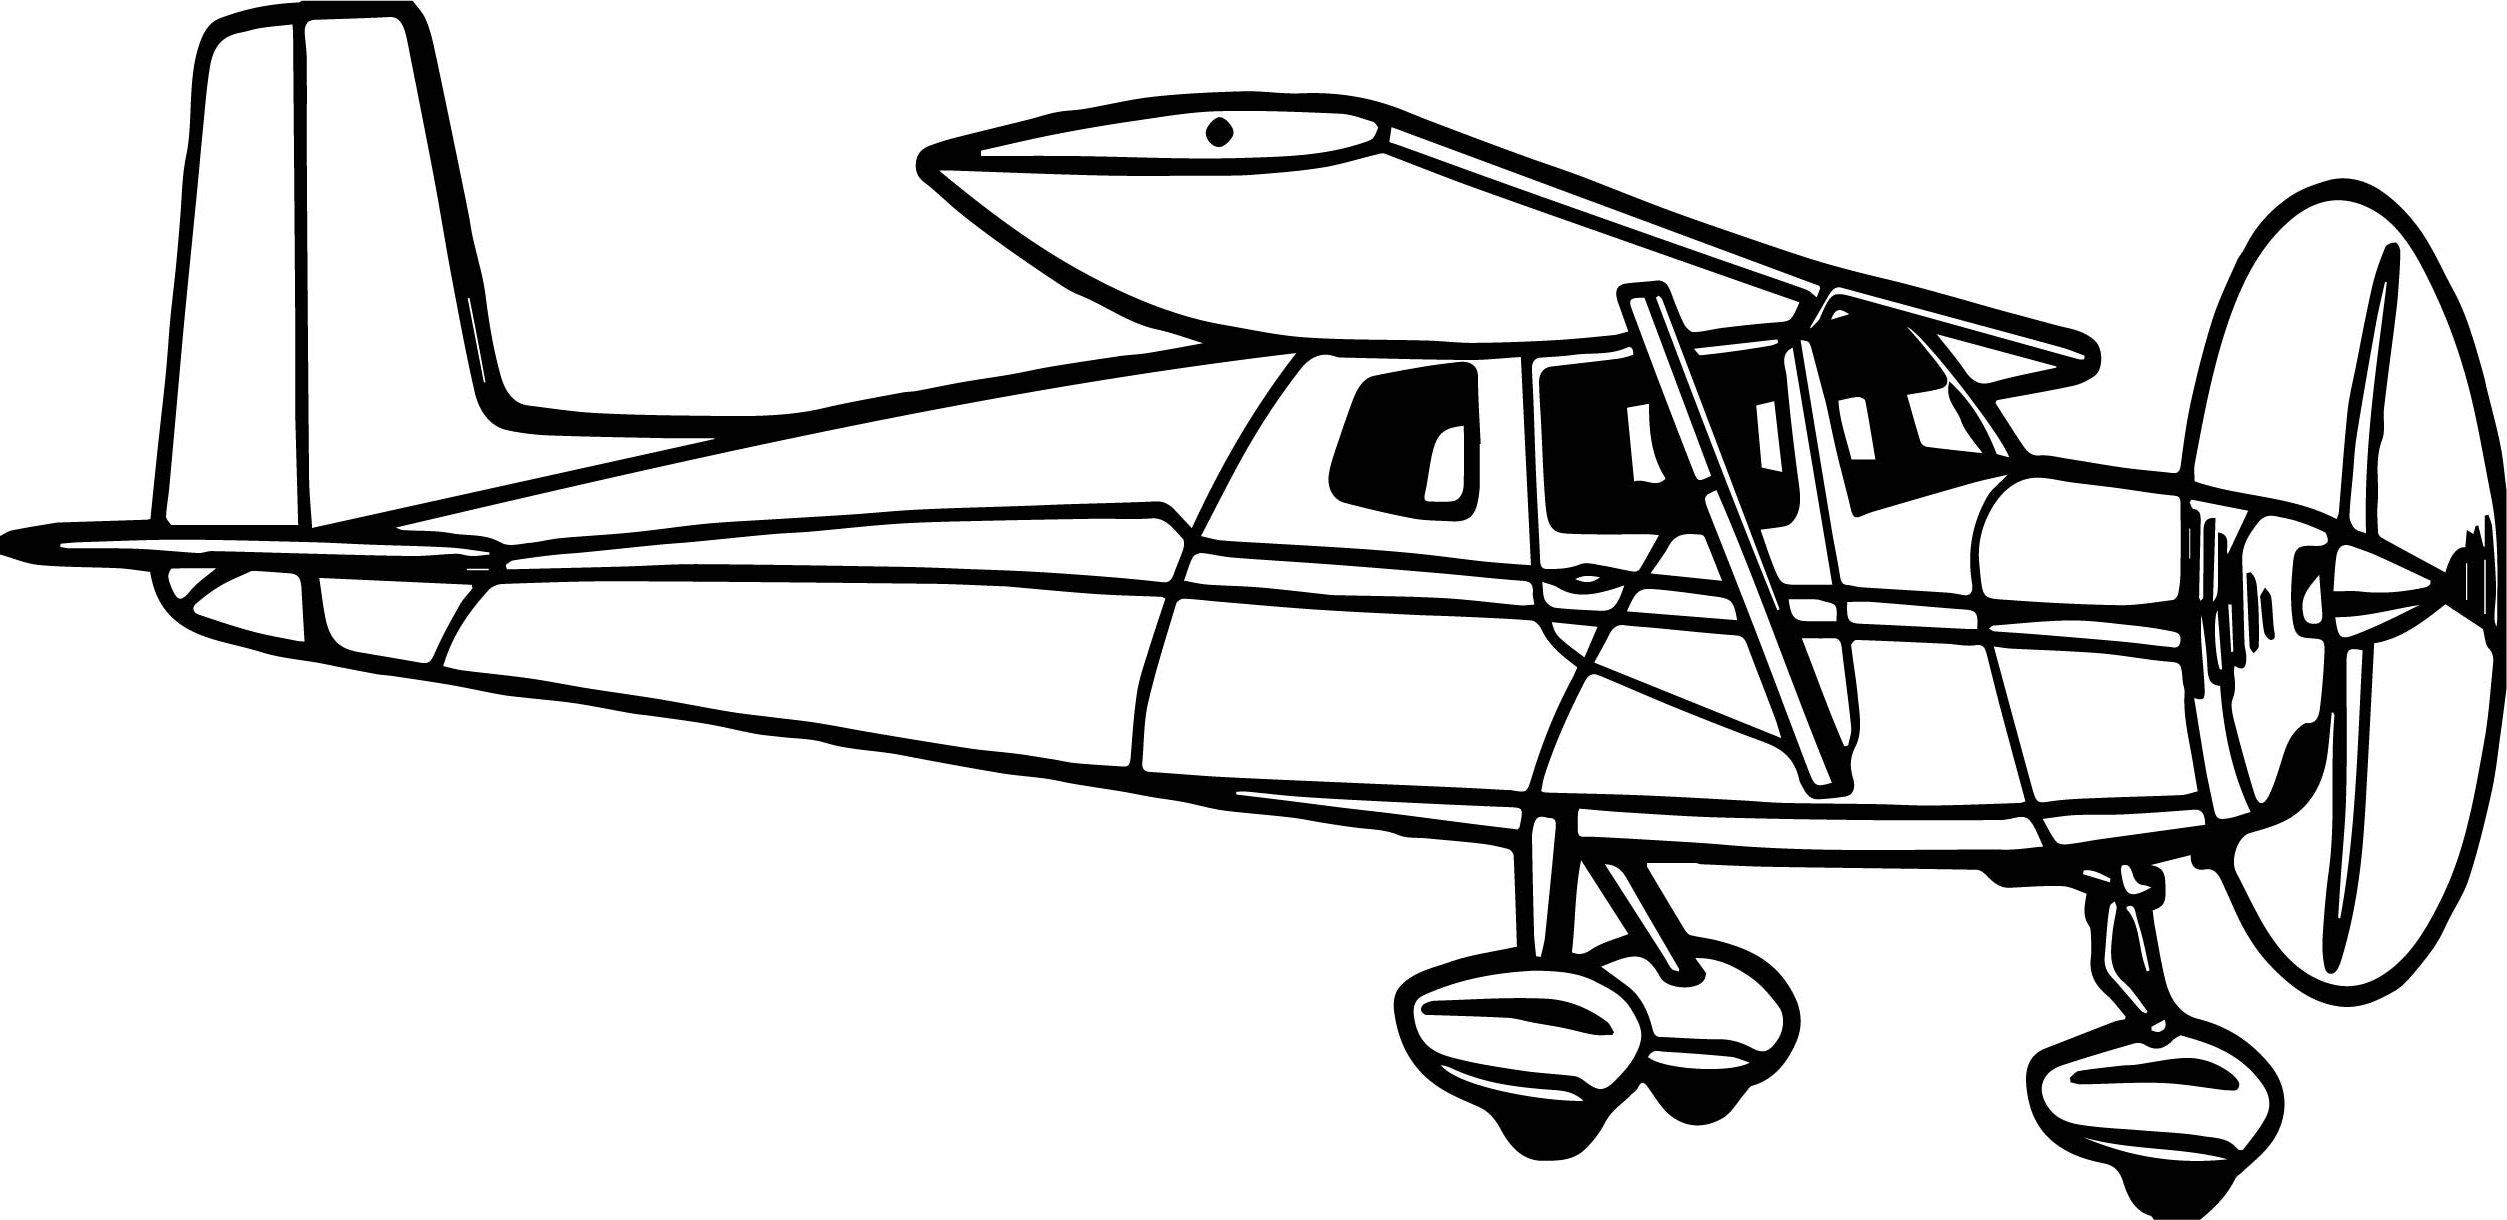 2507x1220 Aircraft Clipart Cessna Airplane 3018941